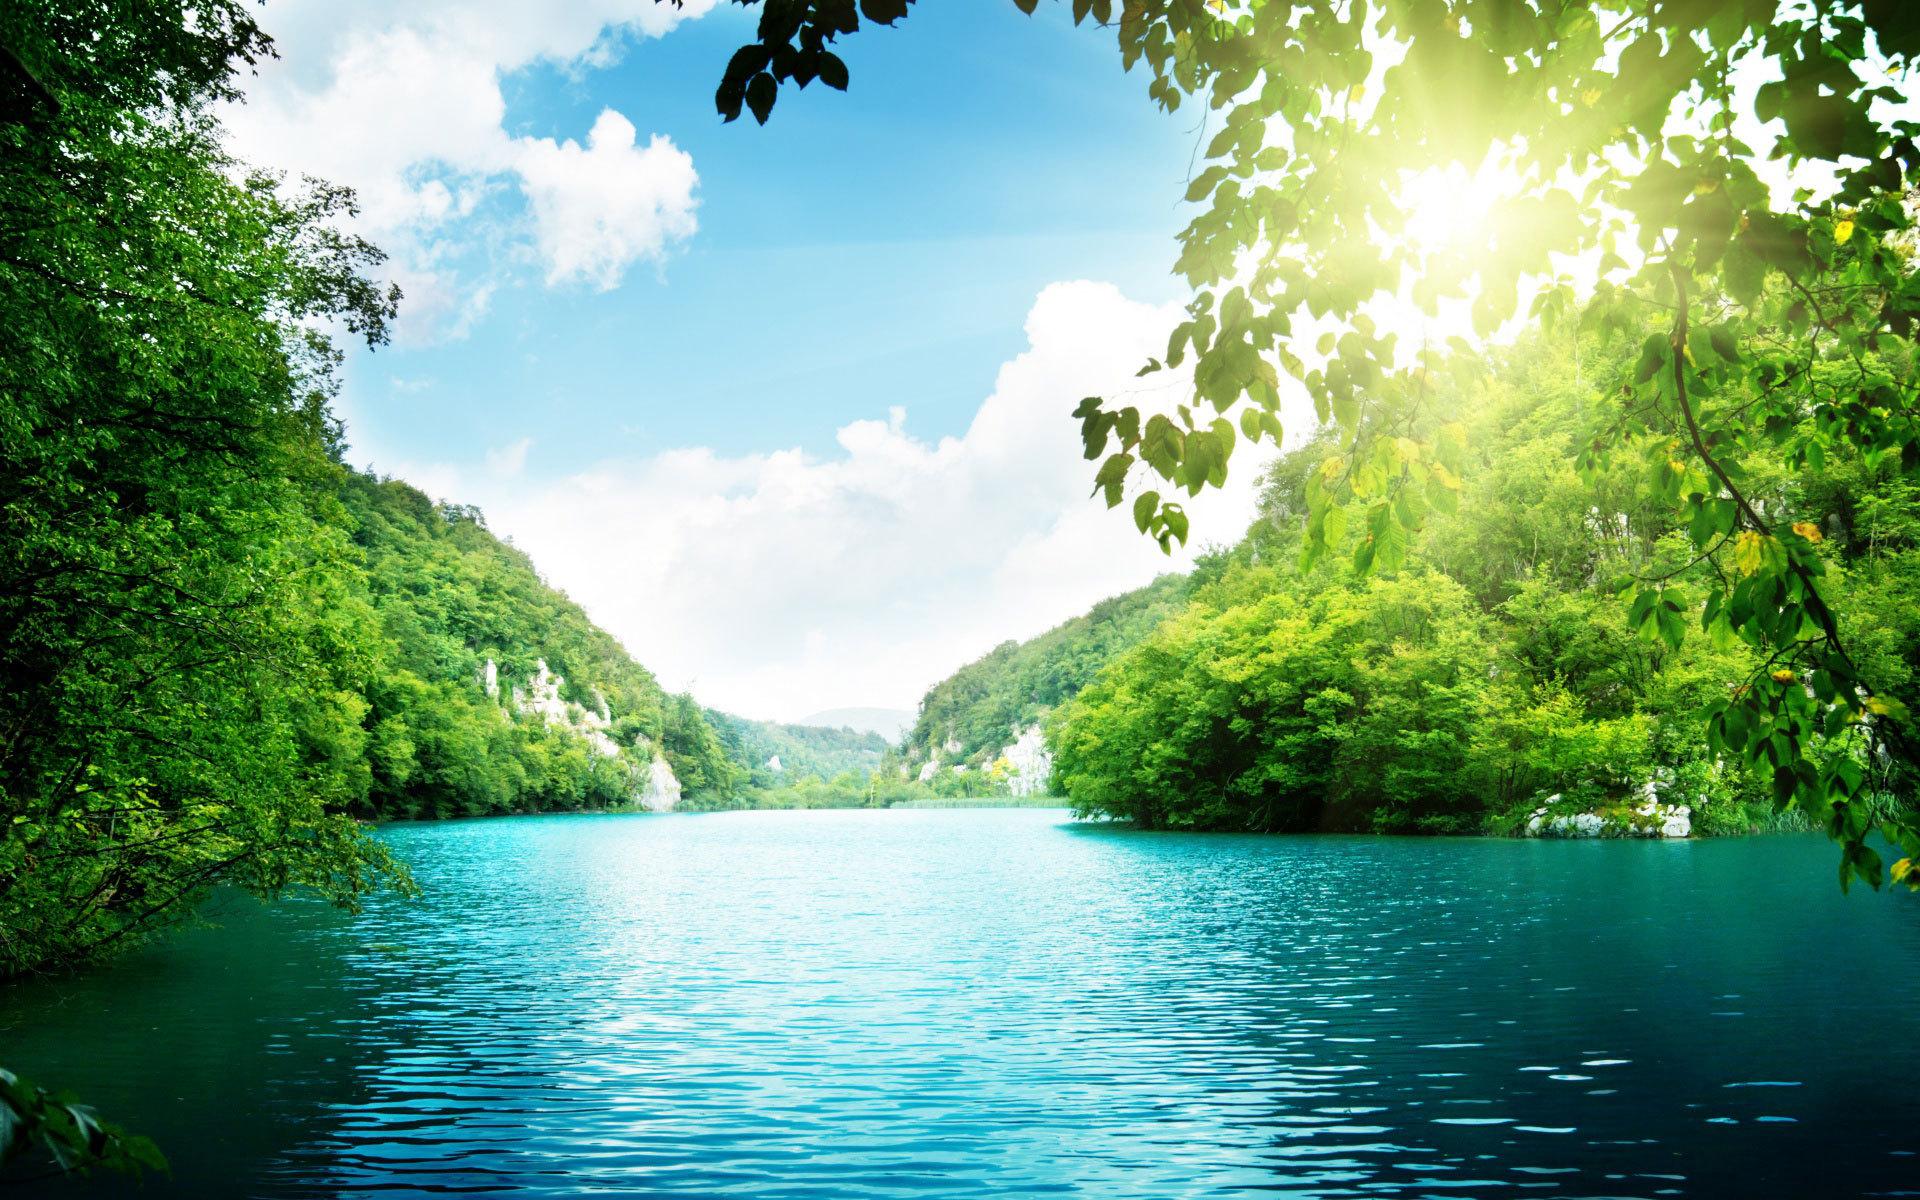 Хочу харчо! - Страница 5 Nature___Seasons___Summer_Lake_of_the_mountains_in_summer_078248_